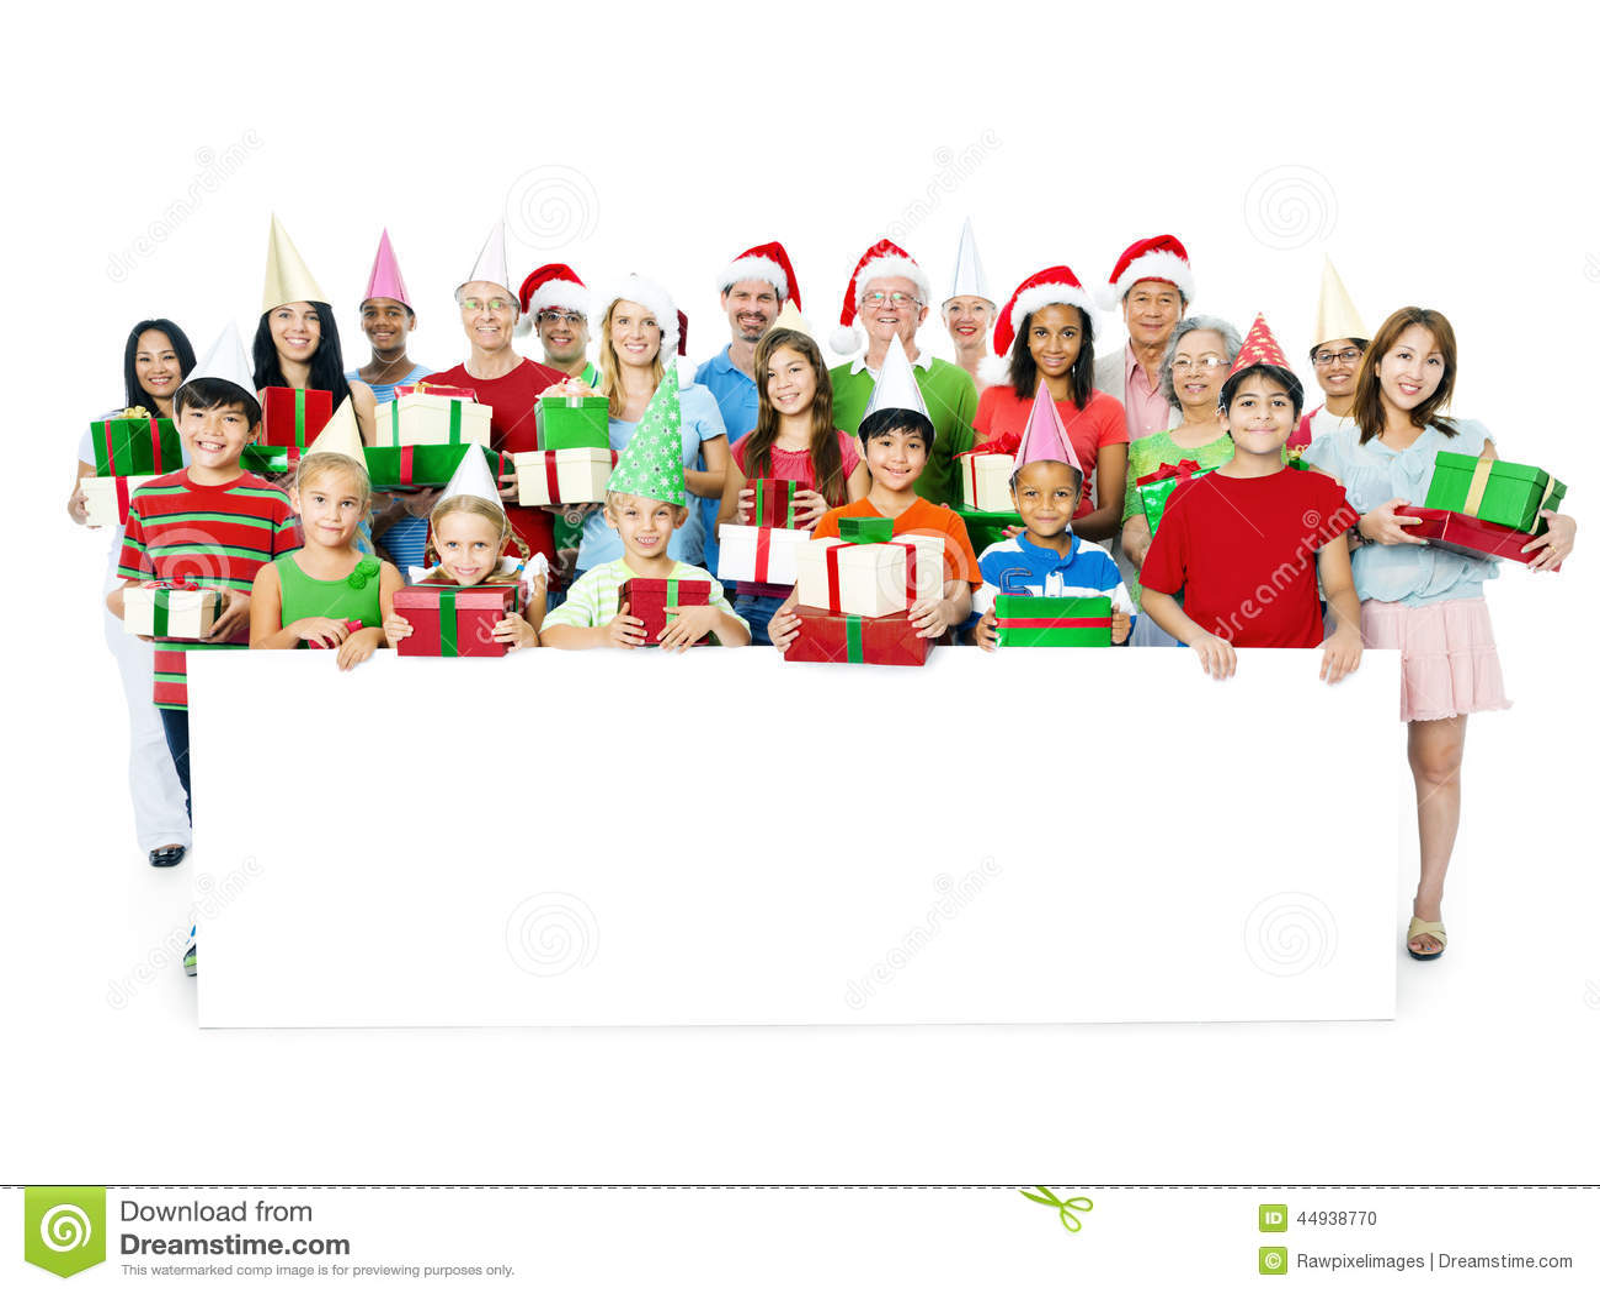 Big Happy Family Celebrating Christmas Togetherness.